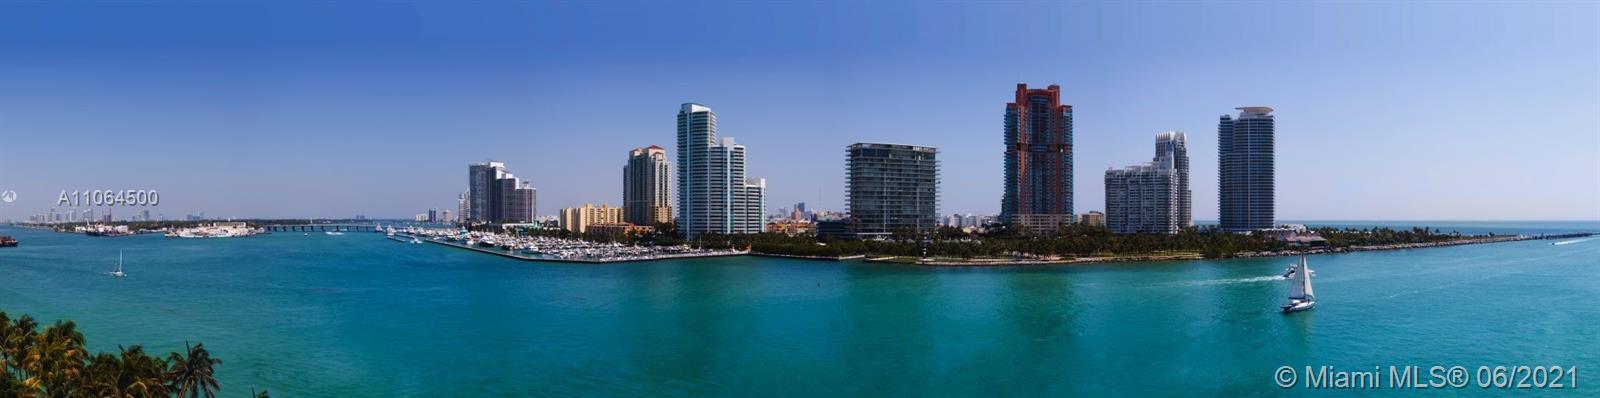 6800 Fisher island-6844 miami-beach-fl-33109-a11064500-Pic01